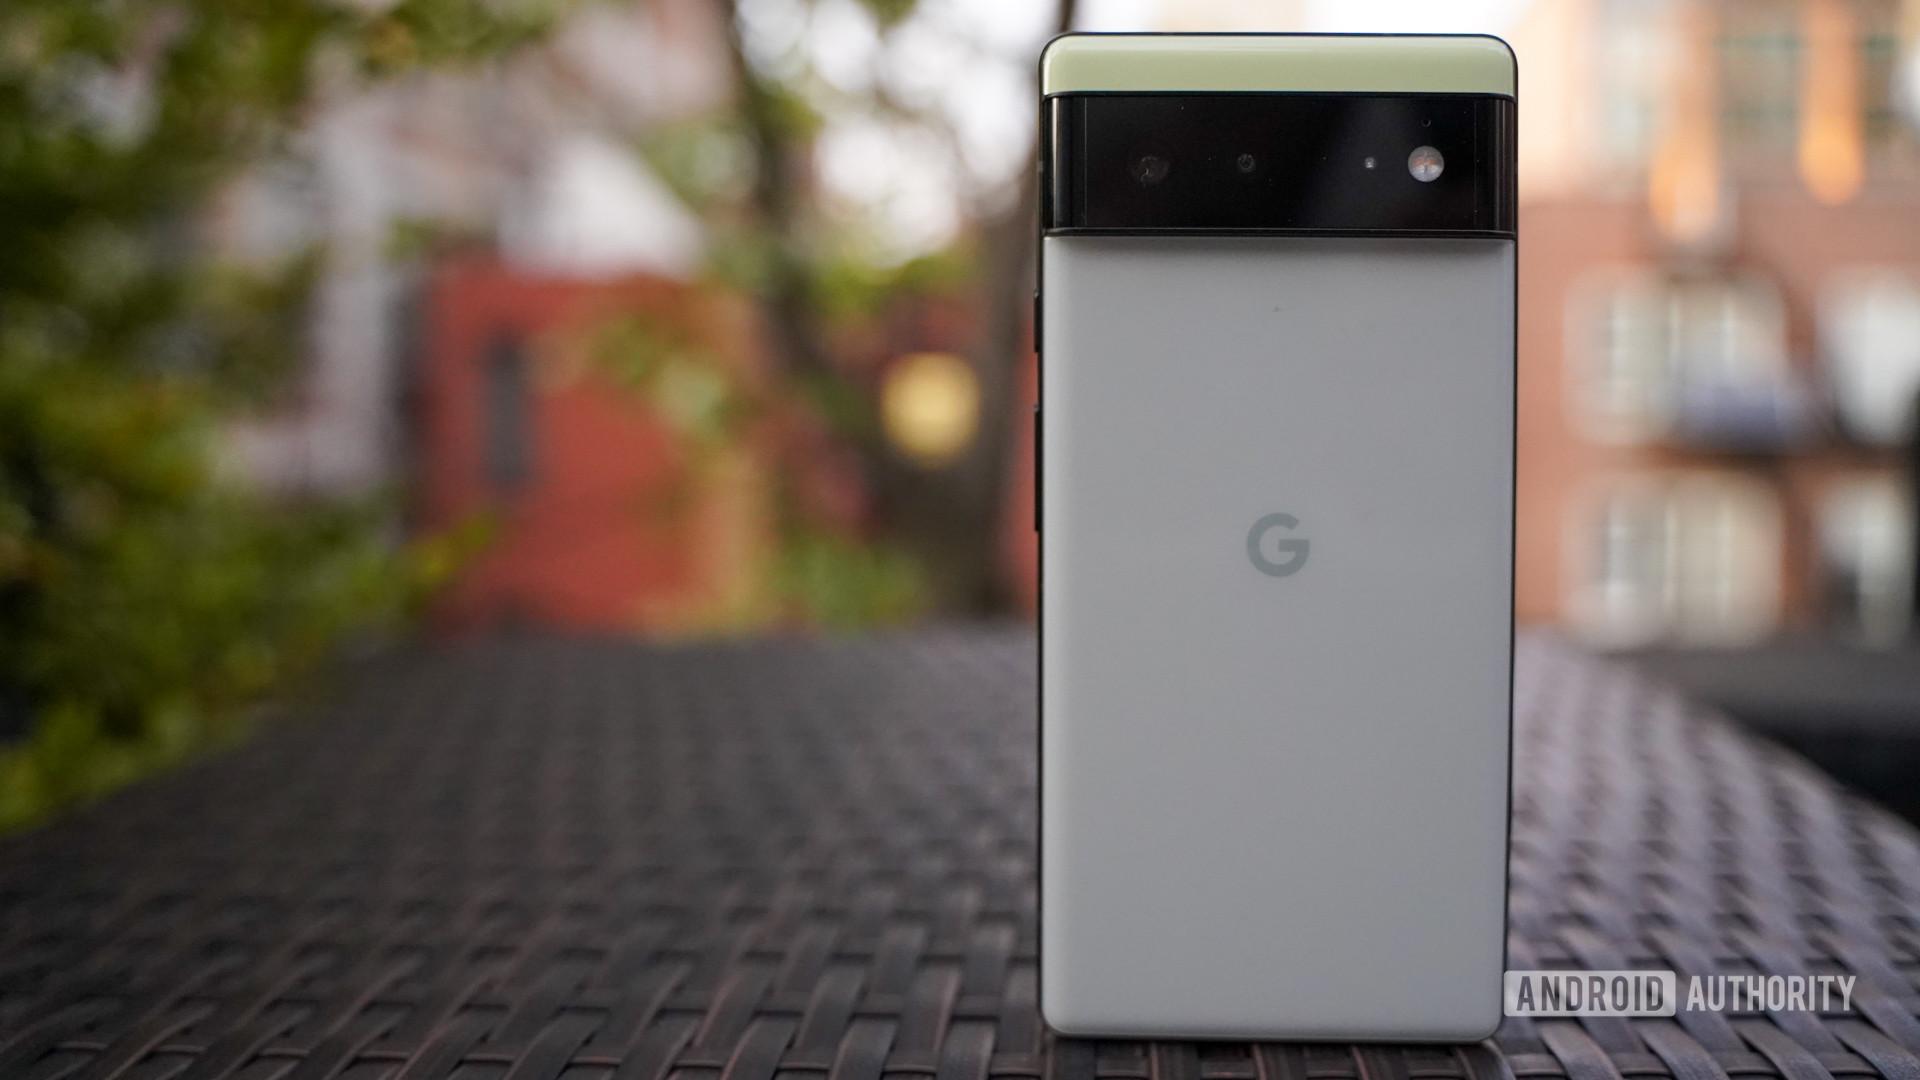 Google Pixel 6 rear panel